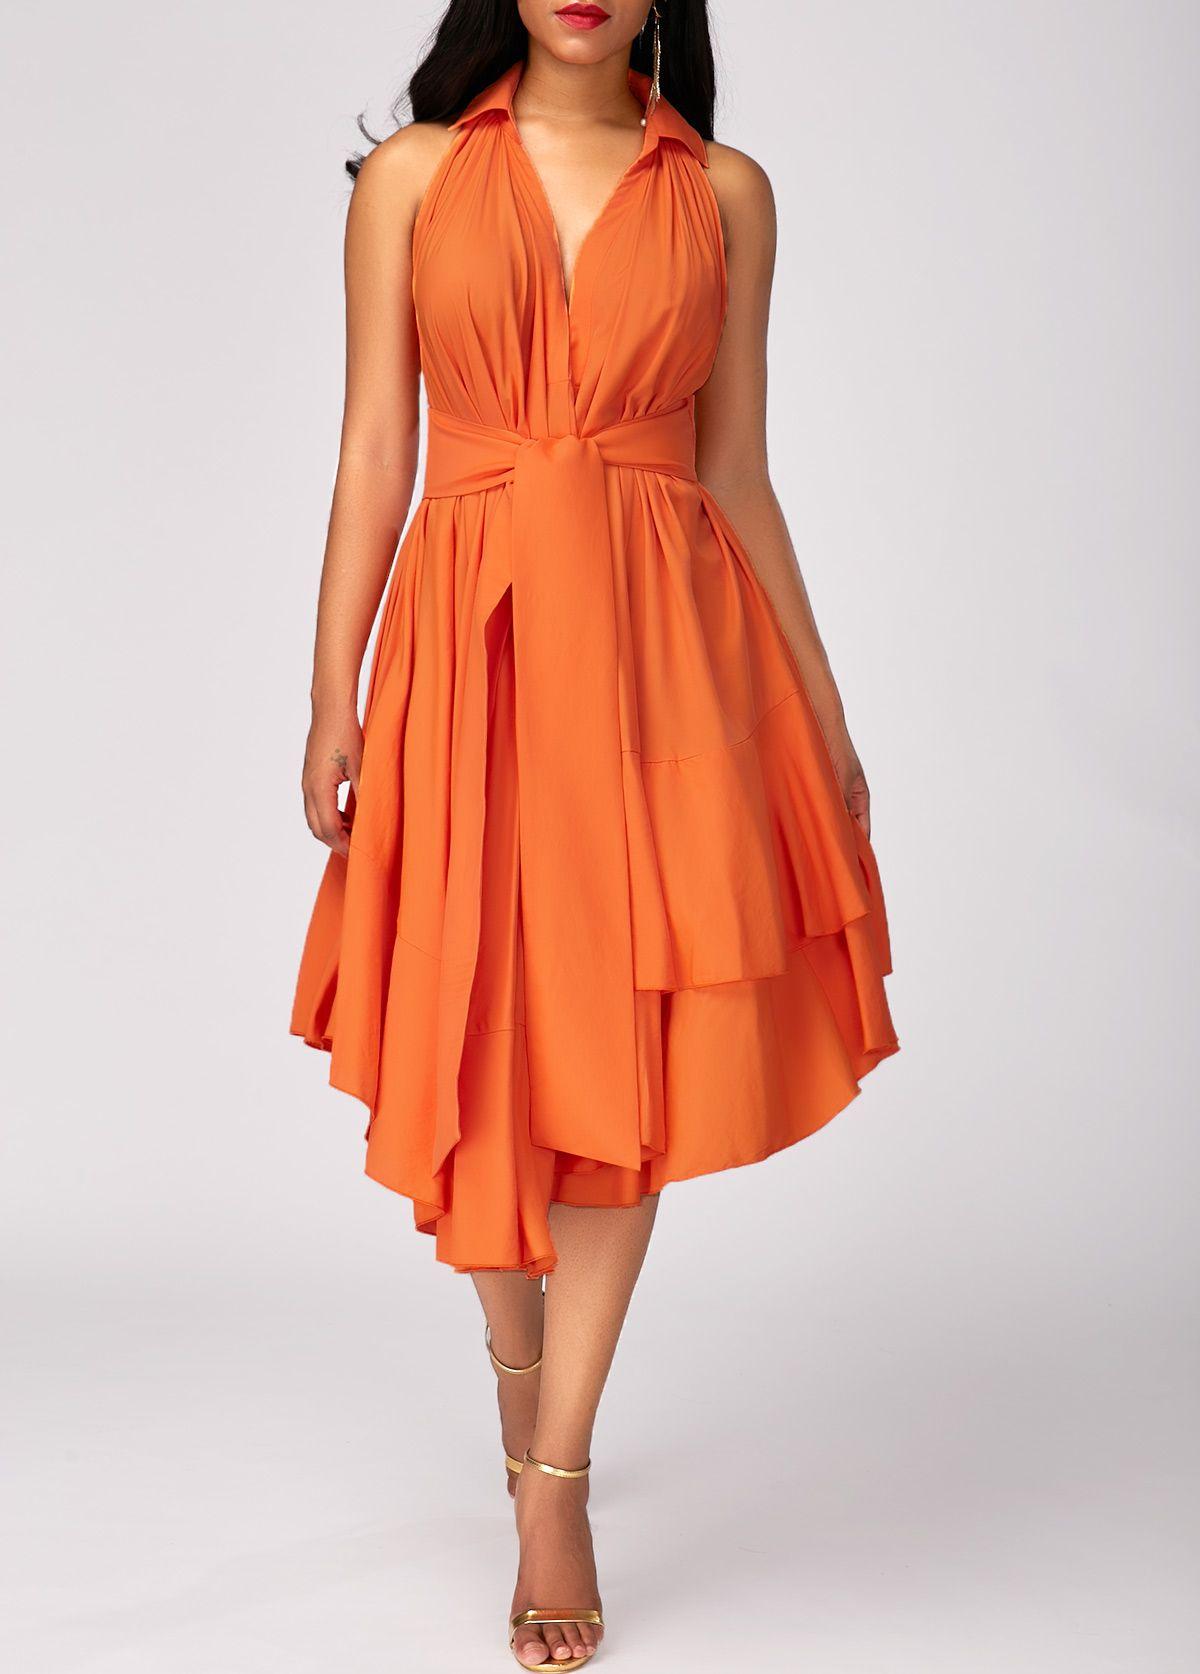 Orange High Waist Asymmetric Hem Layered Dress On Sale Only Us 32 53 Now Buy Cheap Orange High Waist Asymme Orange Dress Womens Dresses Fashion Dresses Online [ 1674 x 1200 Pixel ]